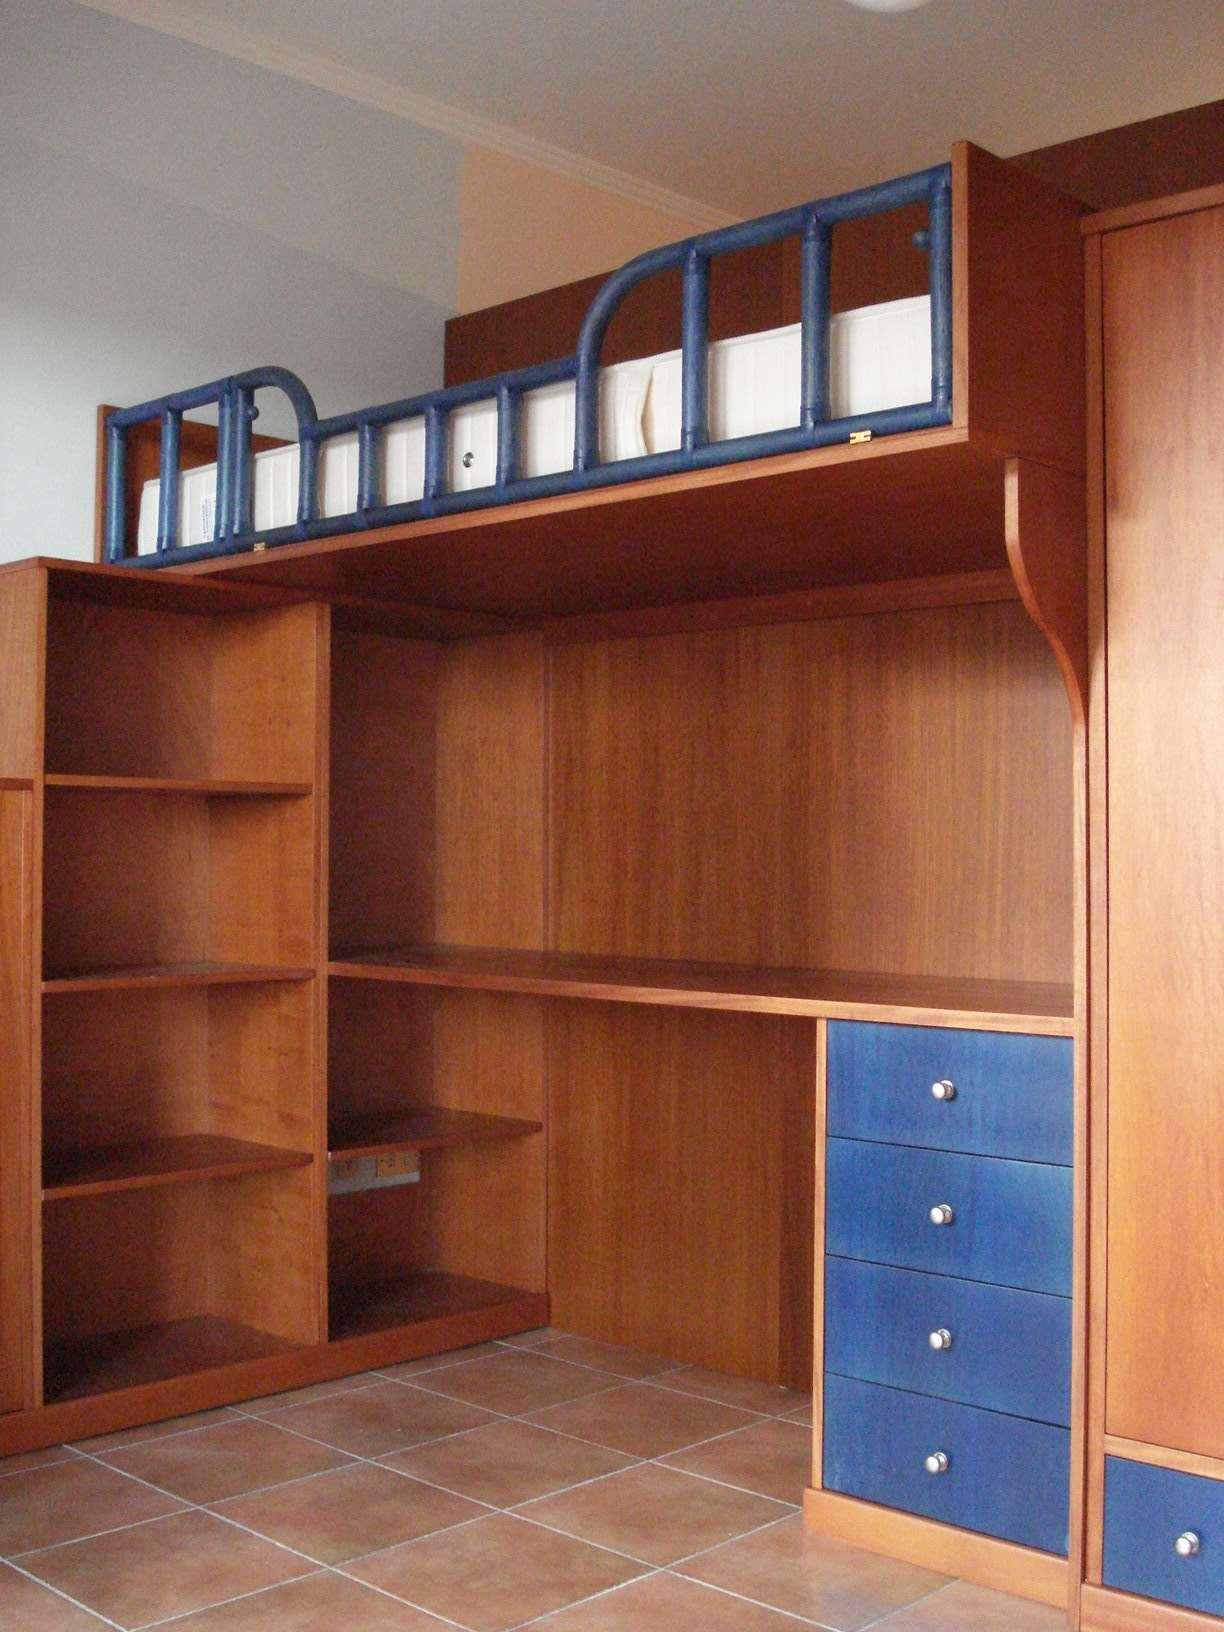 Ikea interni cabine armadio - Ikea cabine armadio prezzi ...